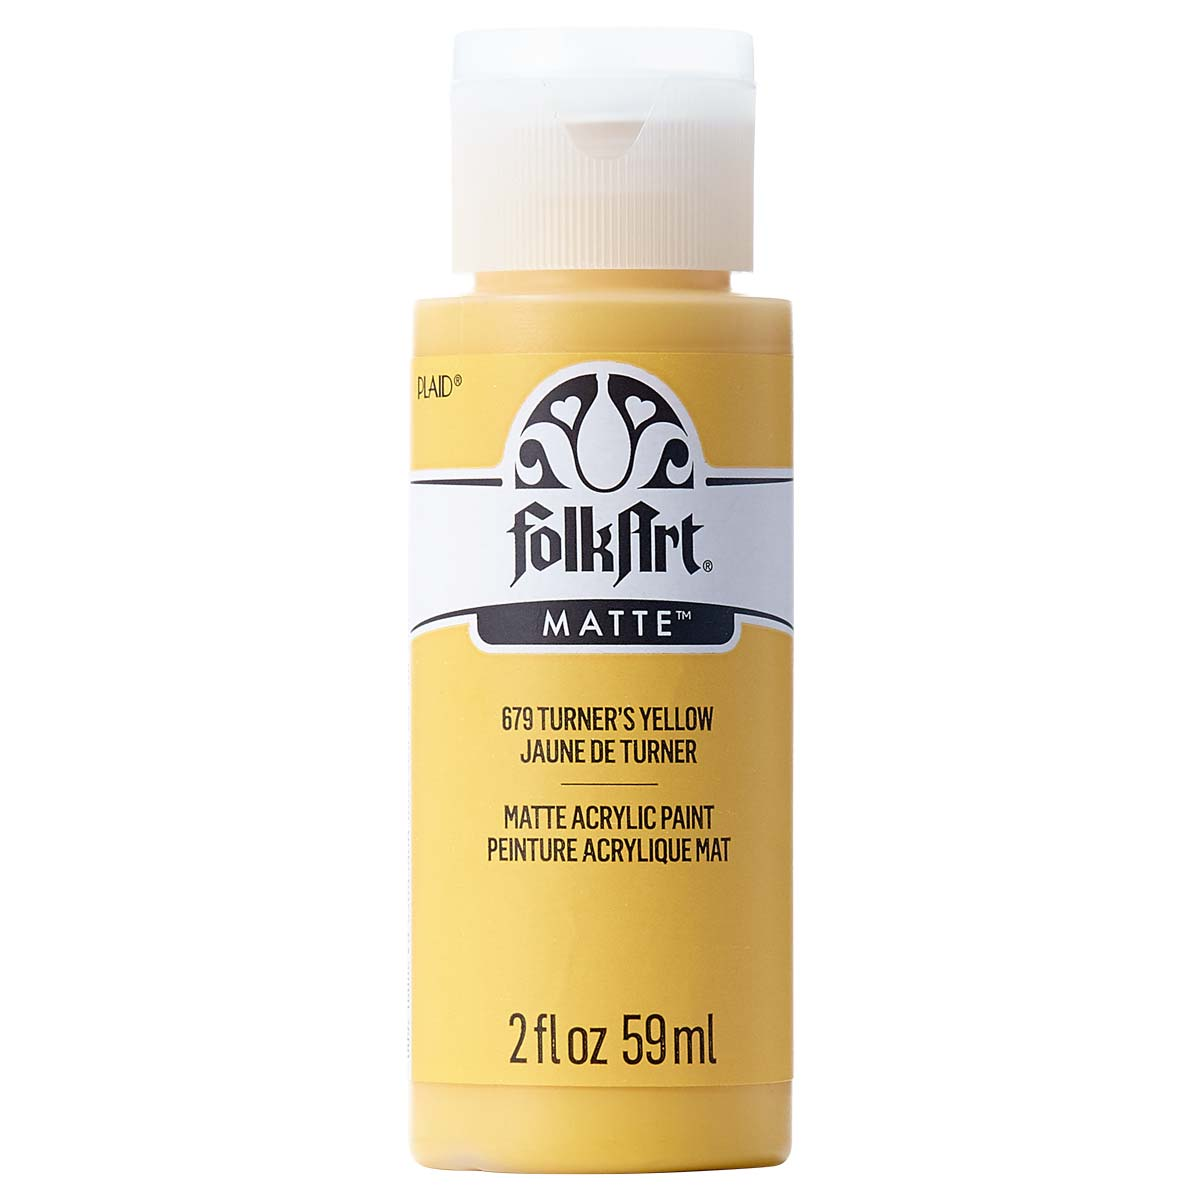 FolkArt ® Acrylic Colors - Turner's Yellow, 2 oz. - 679